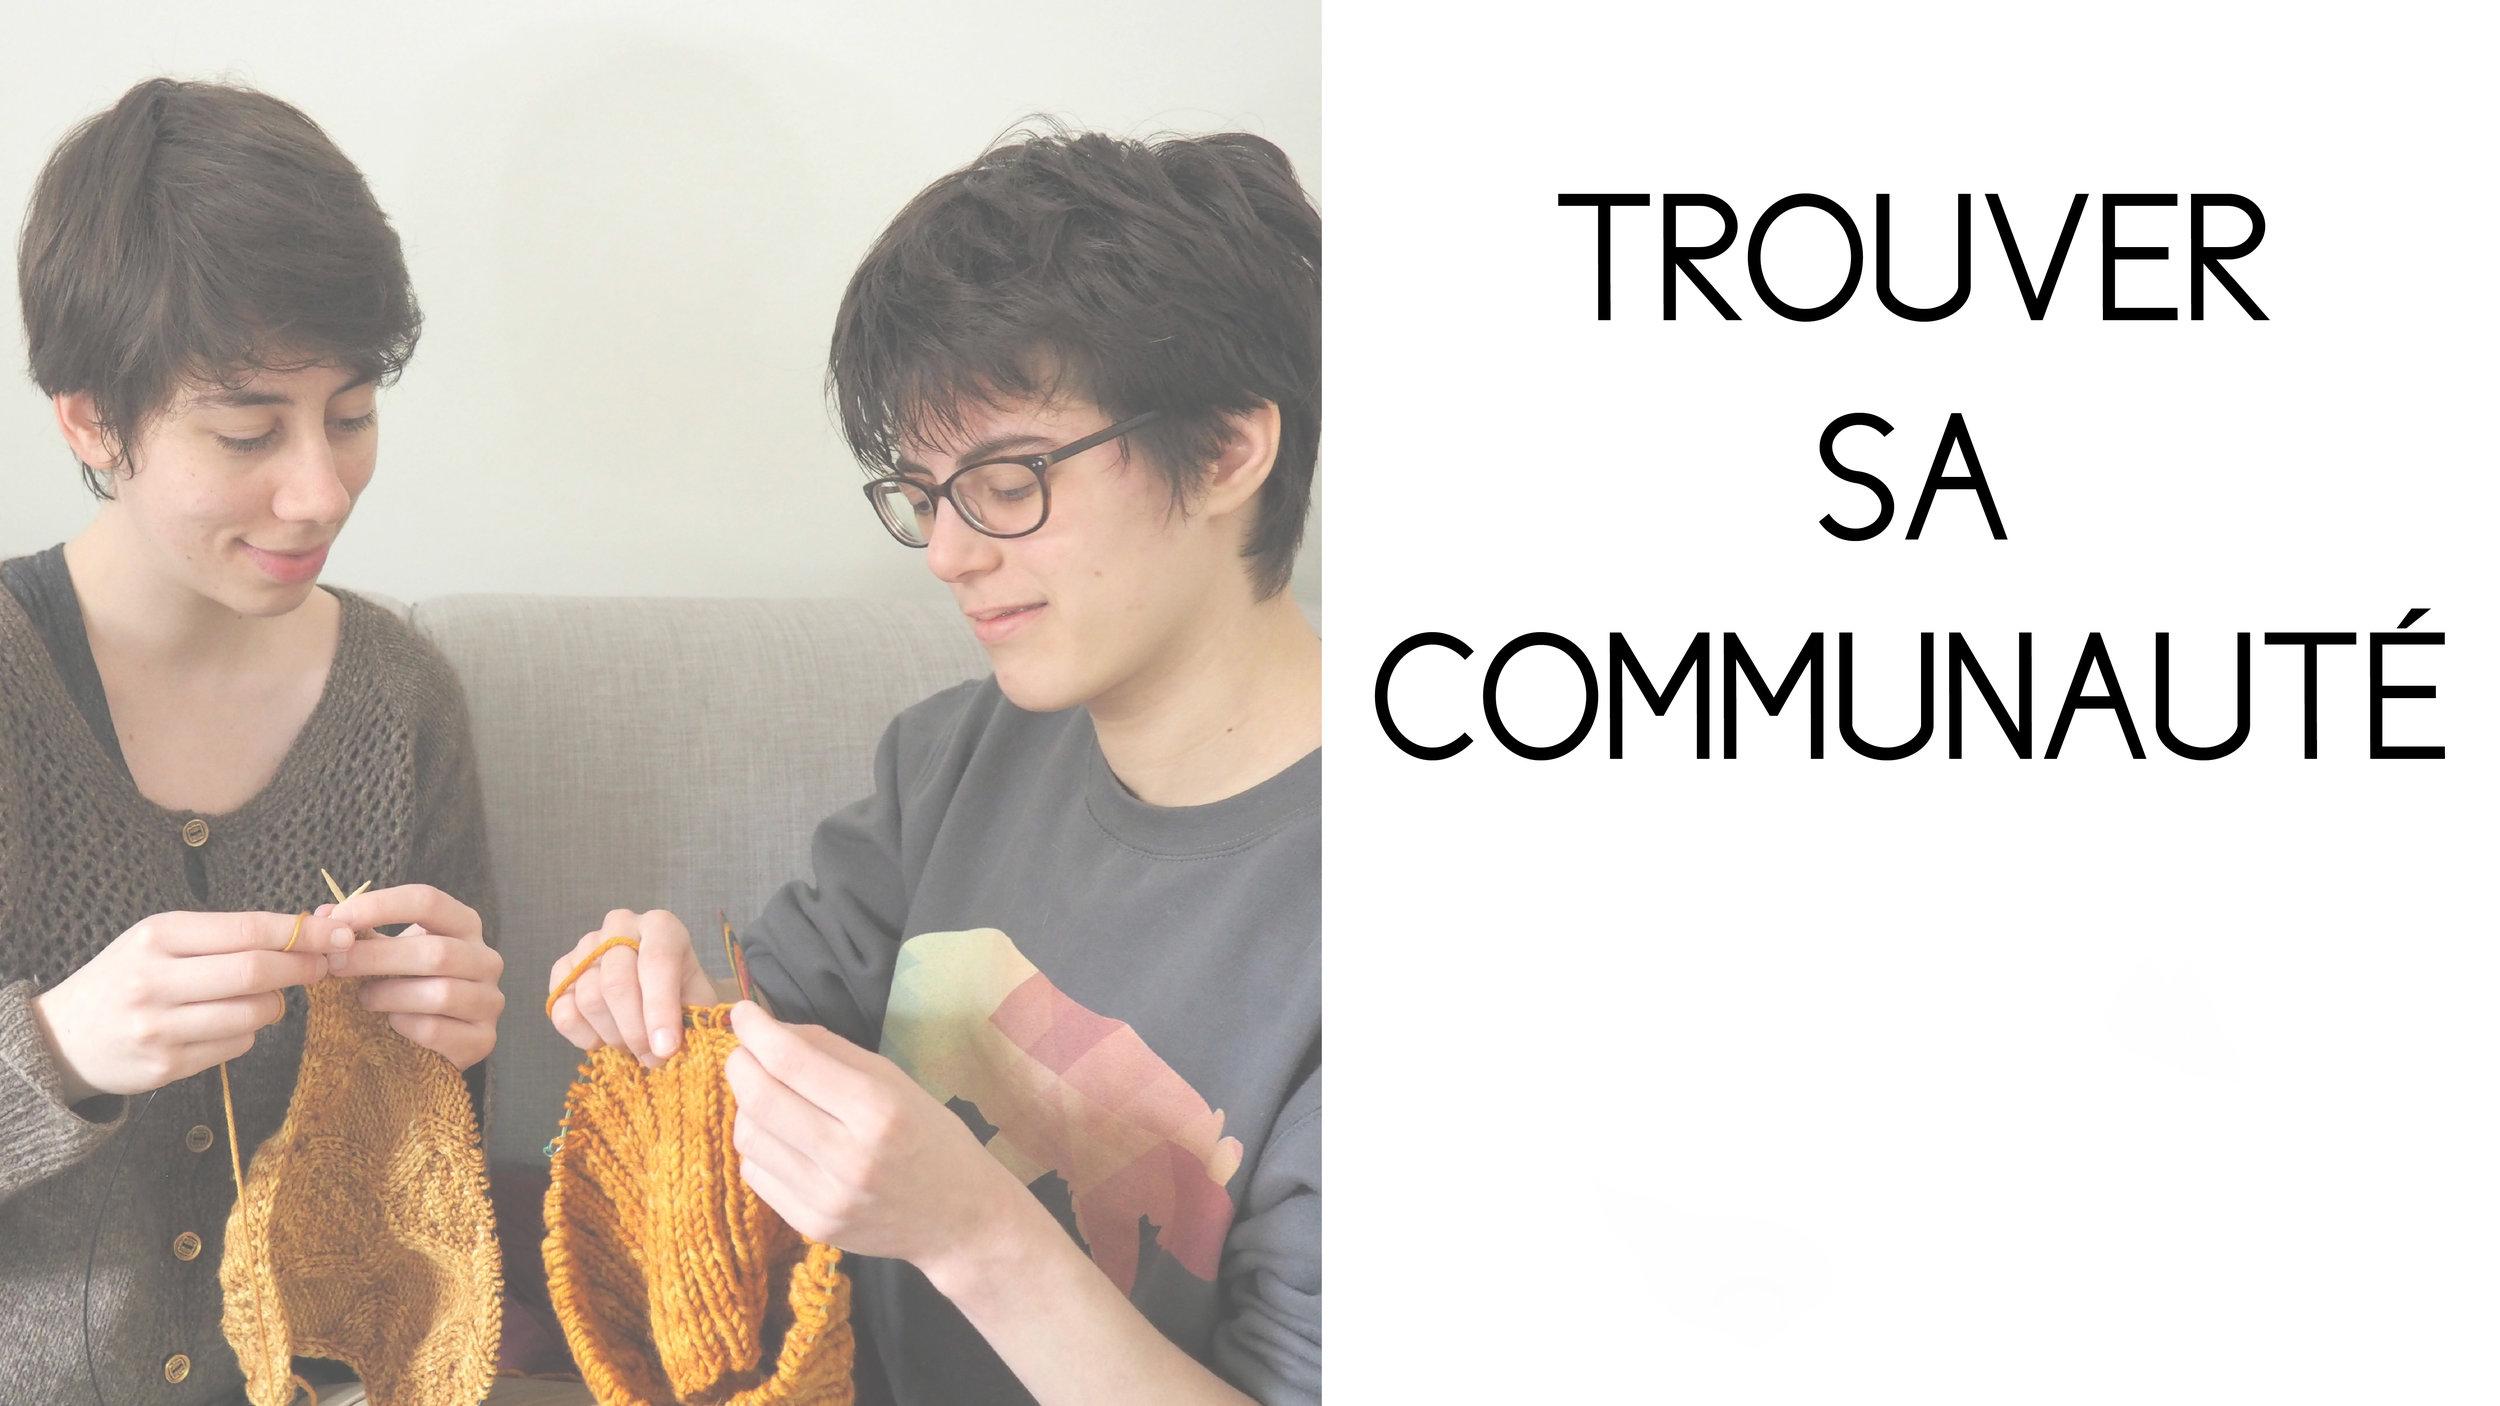 Finding communituy blog post bis FR.jpg